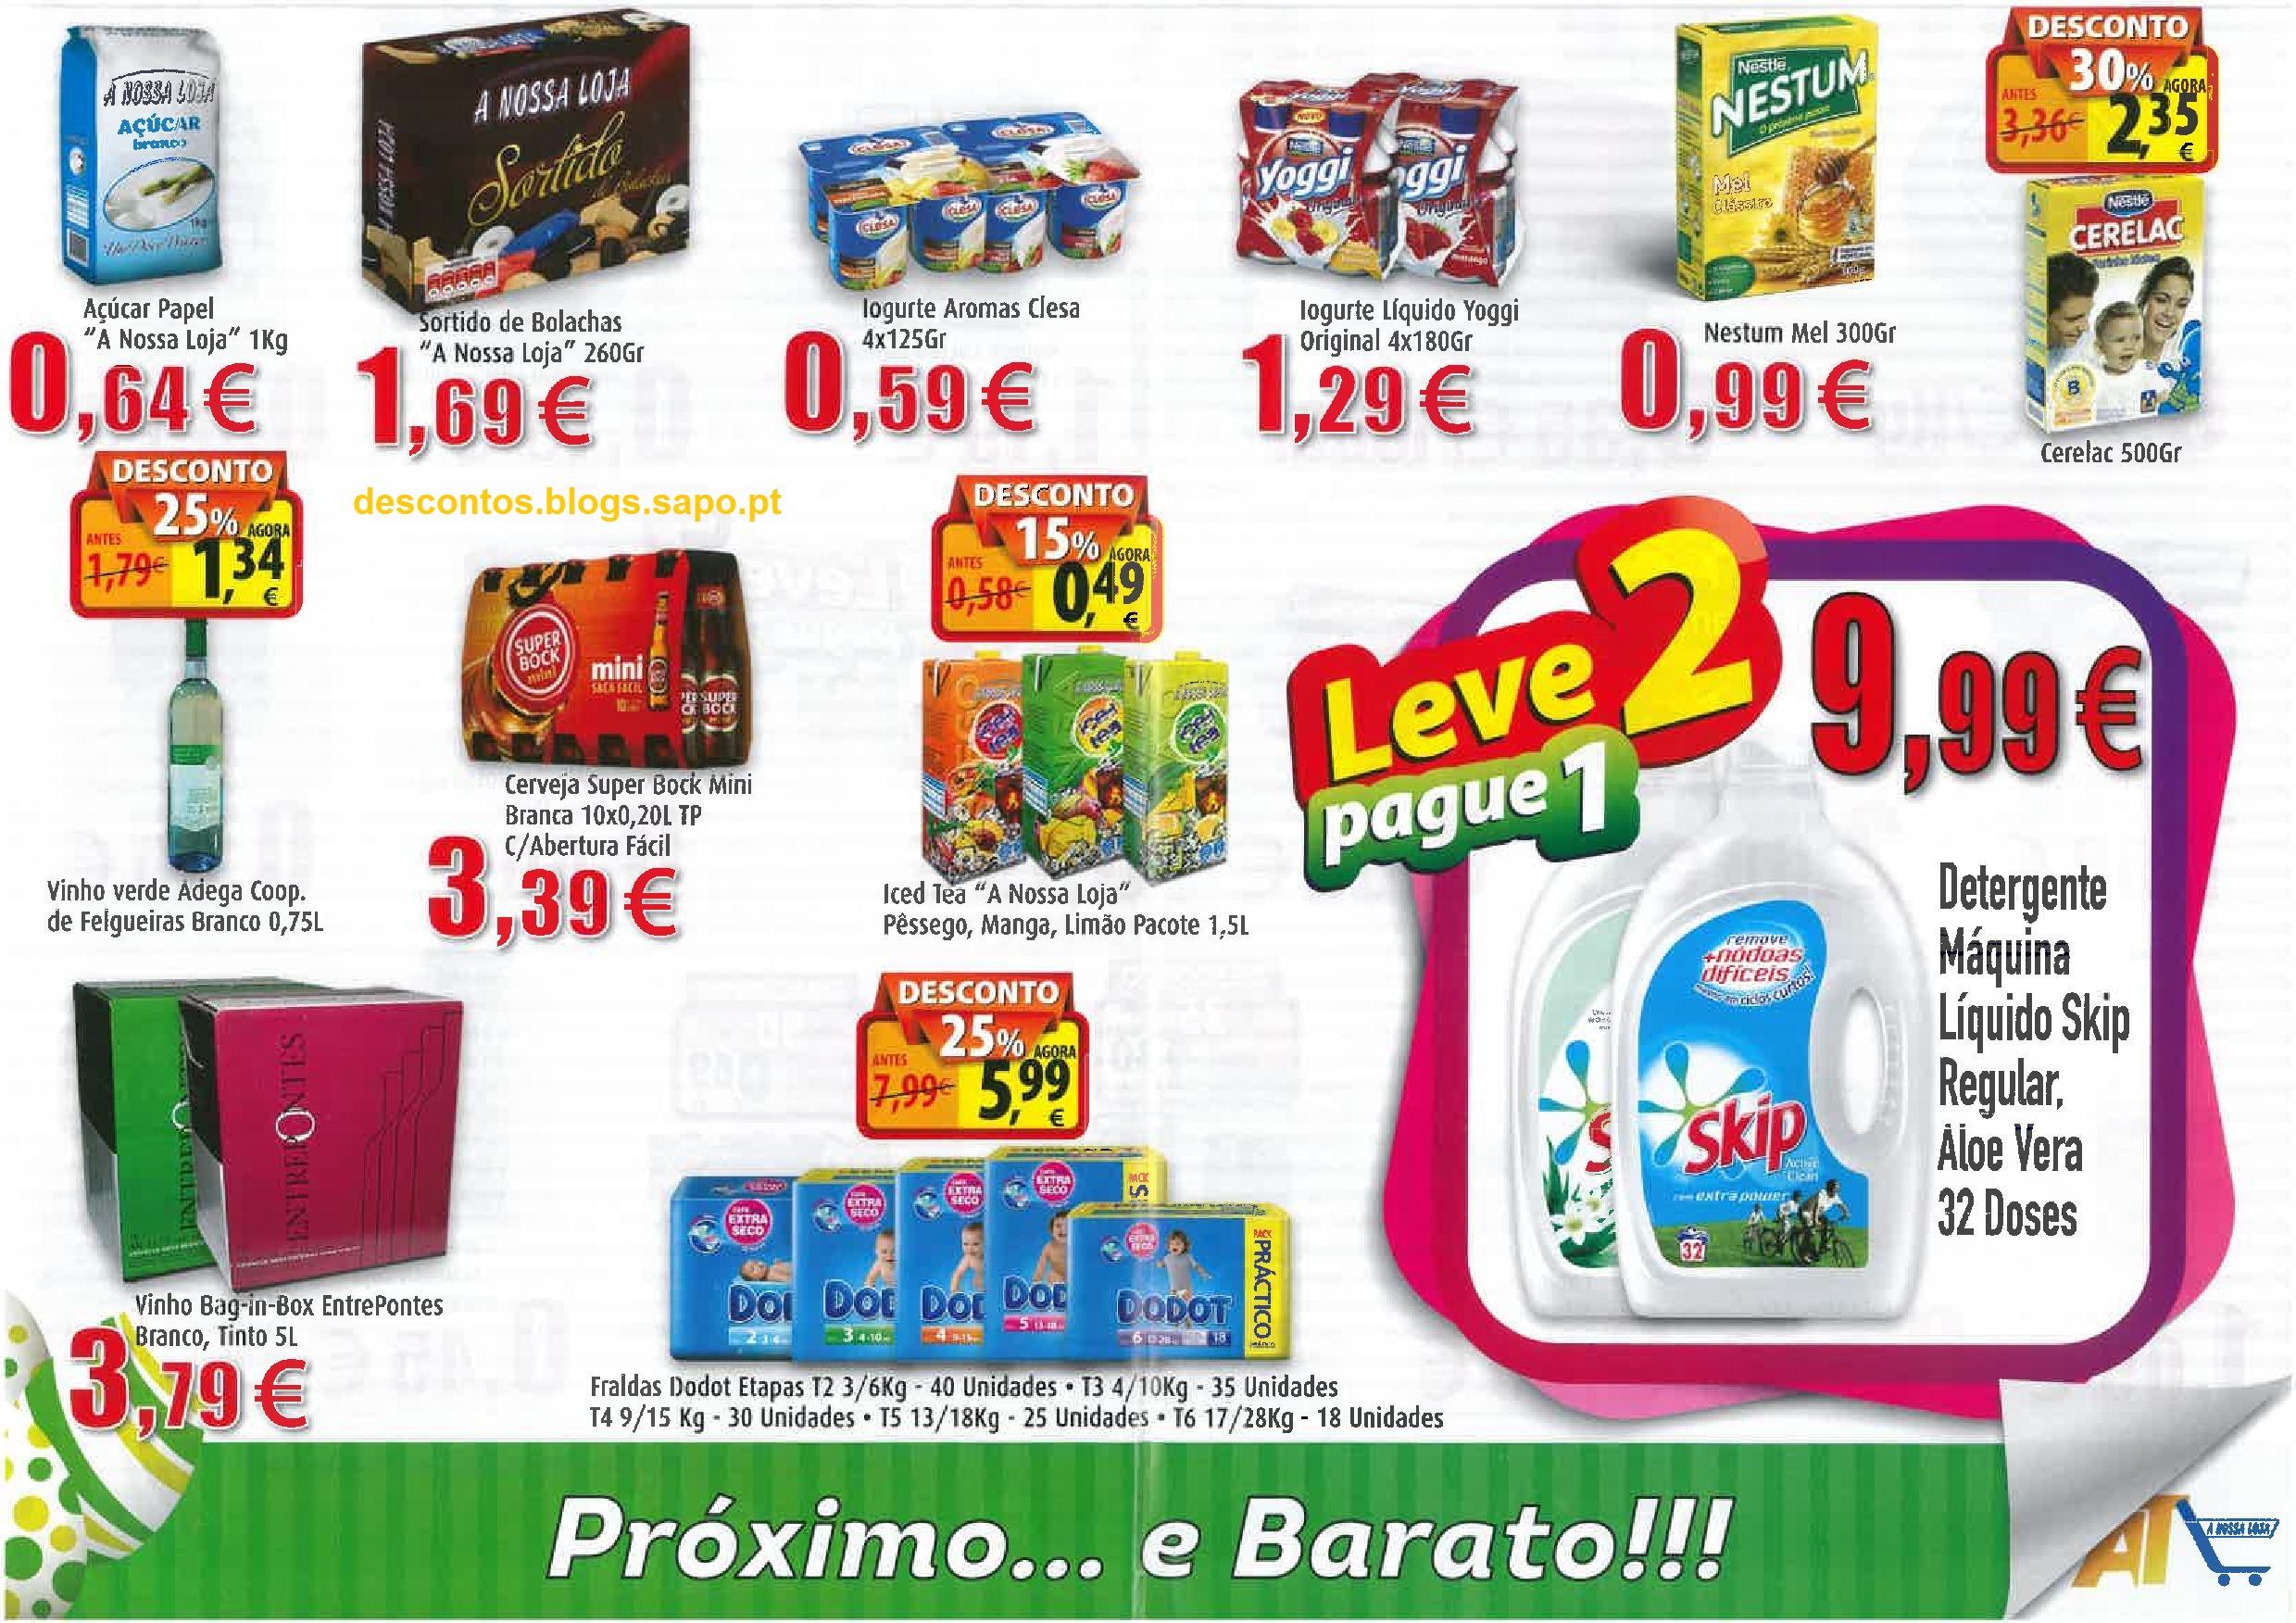 Folheto Minimercado Ribeiro 20150221-page-002.jpg